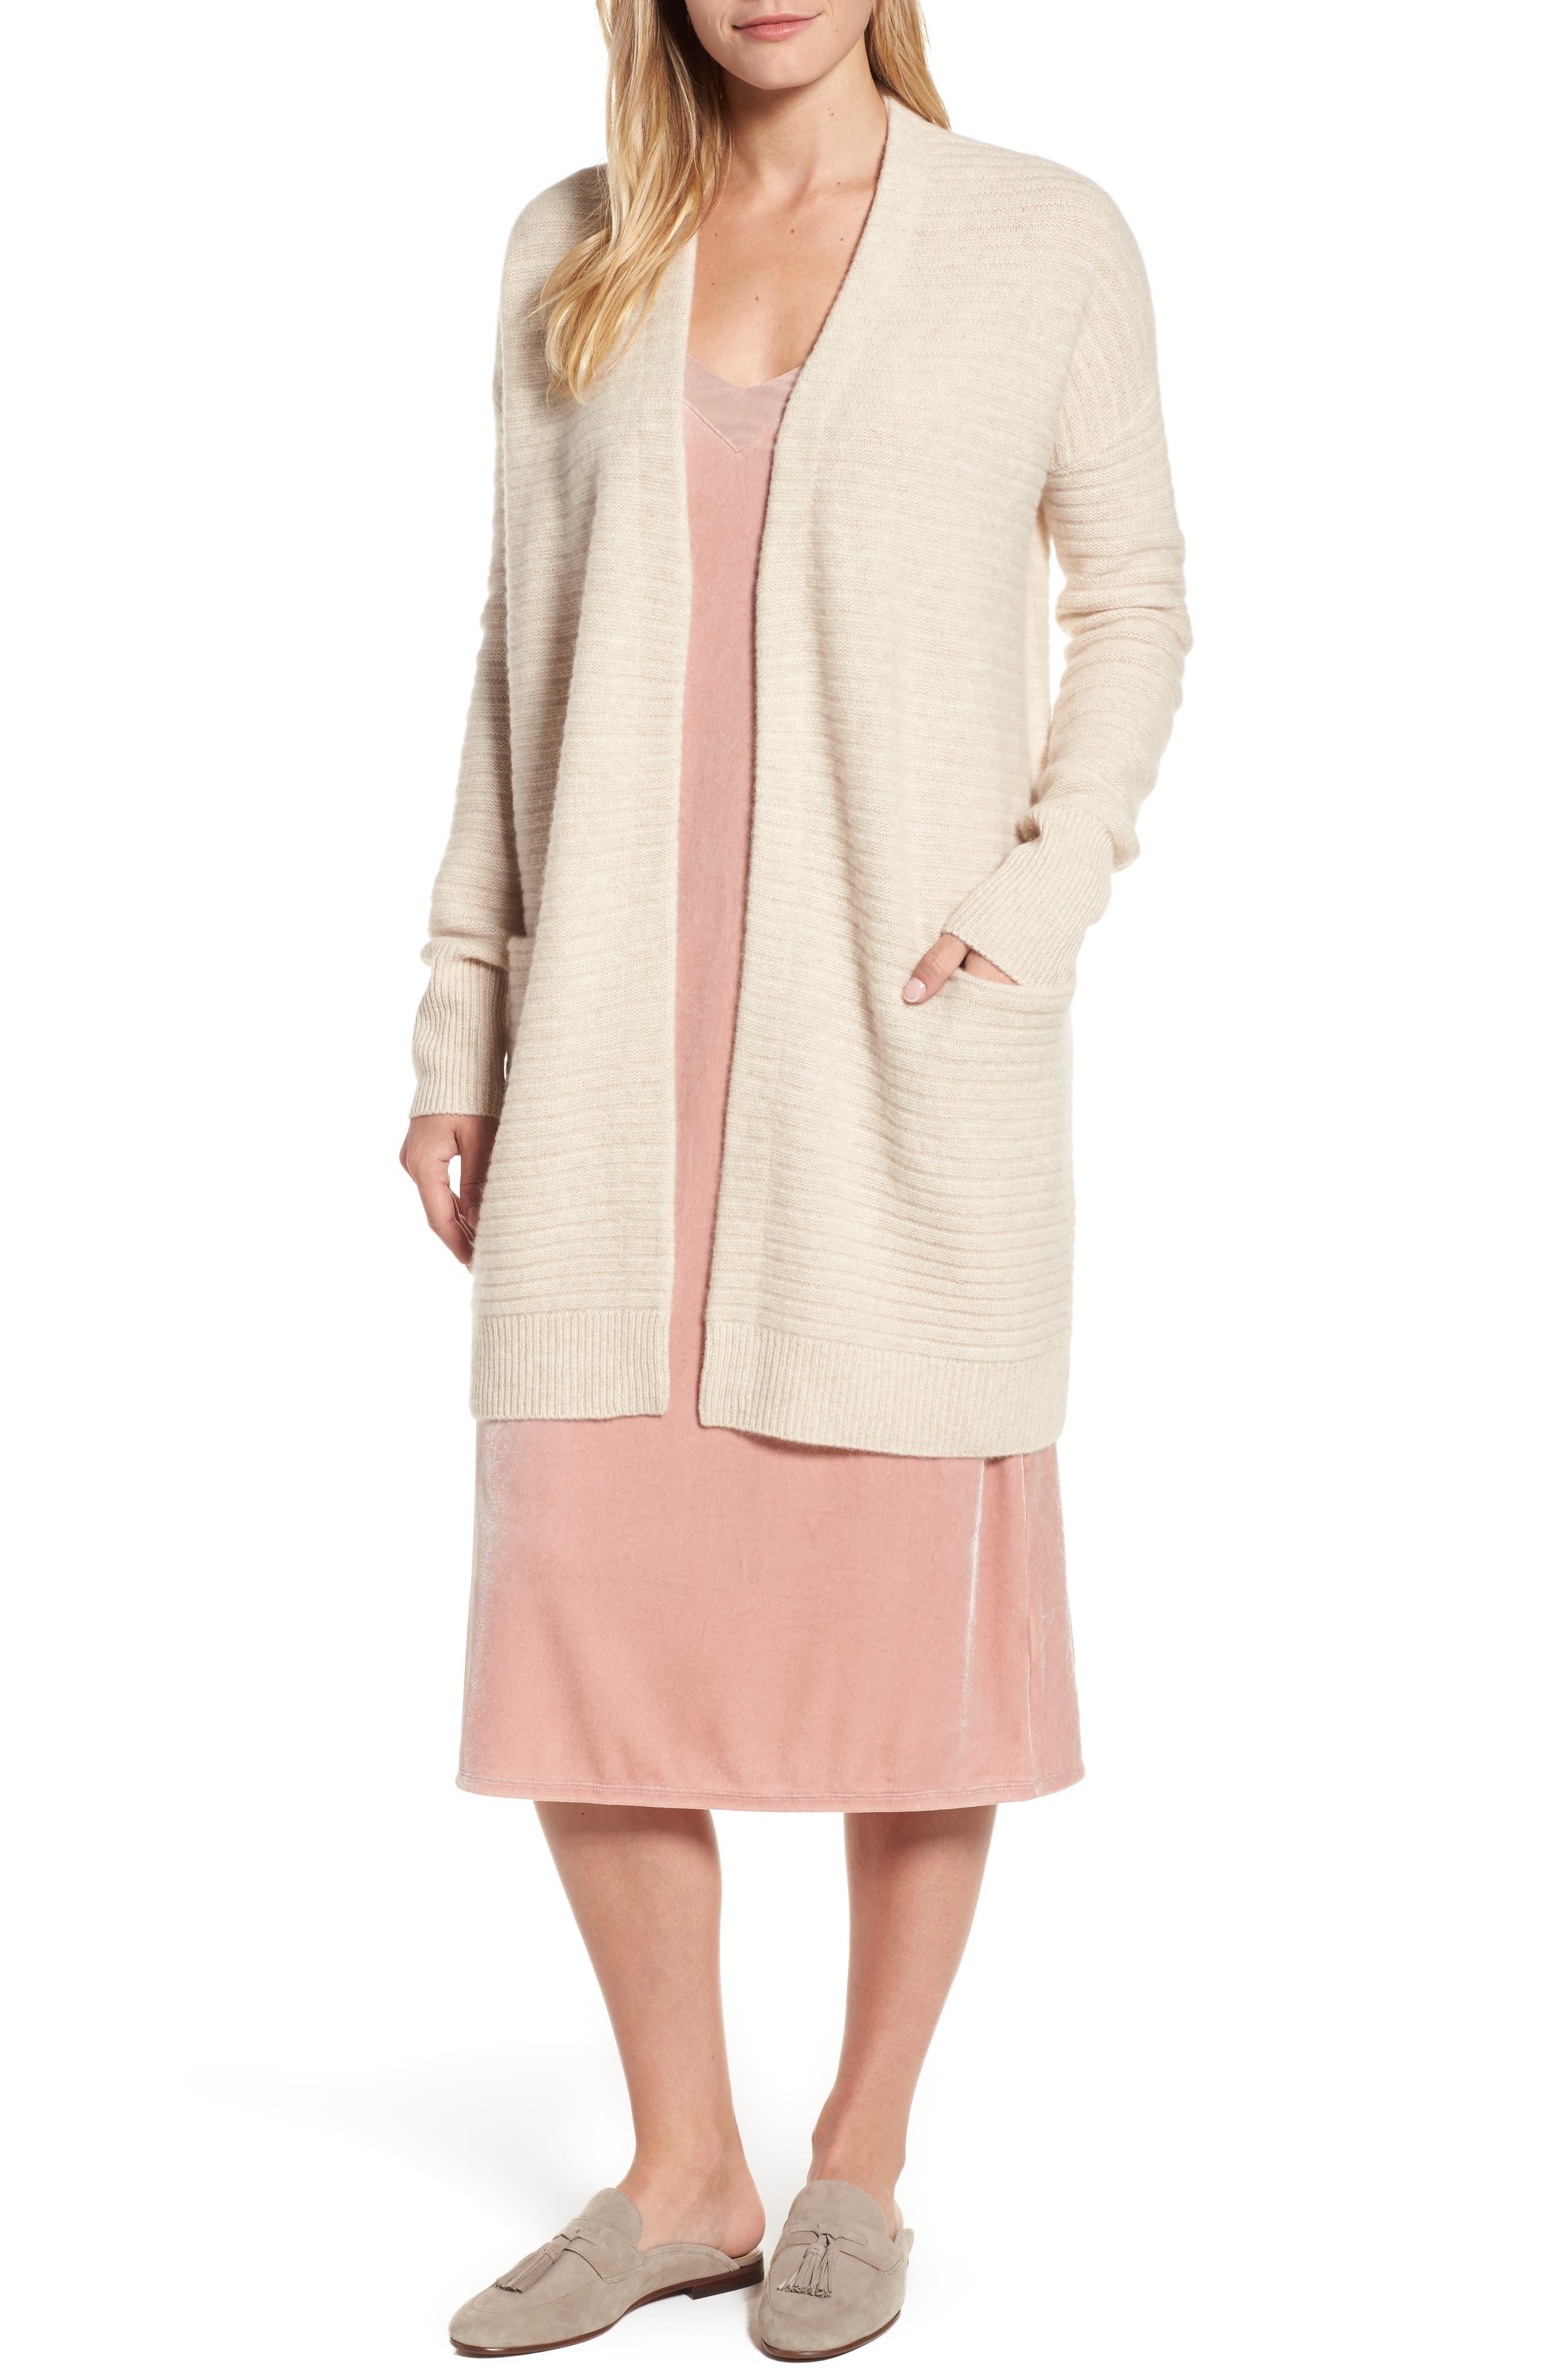 Alternate Image 1 Selected - Halogen® Ribbed Cashmere Cardigan (Regular & Petite)